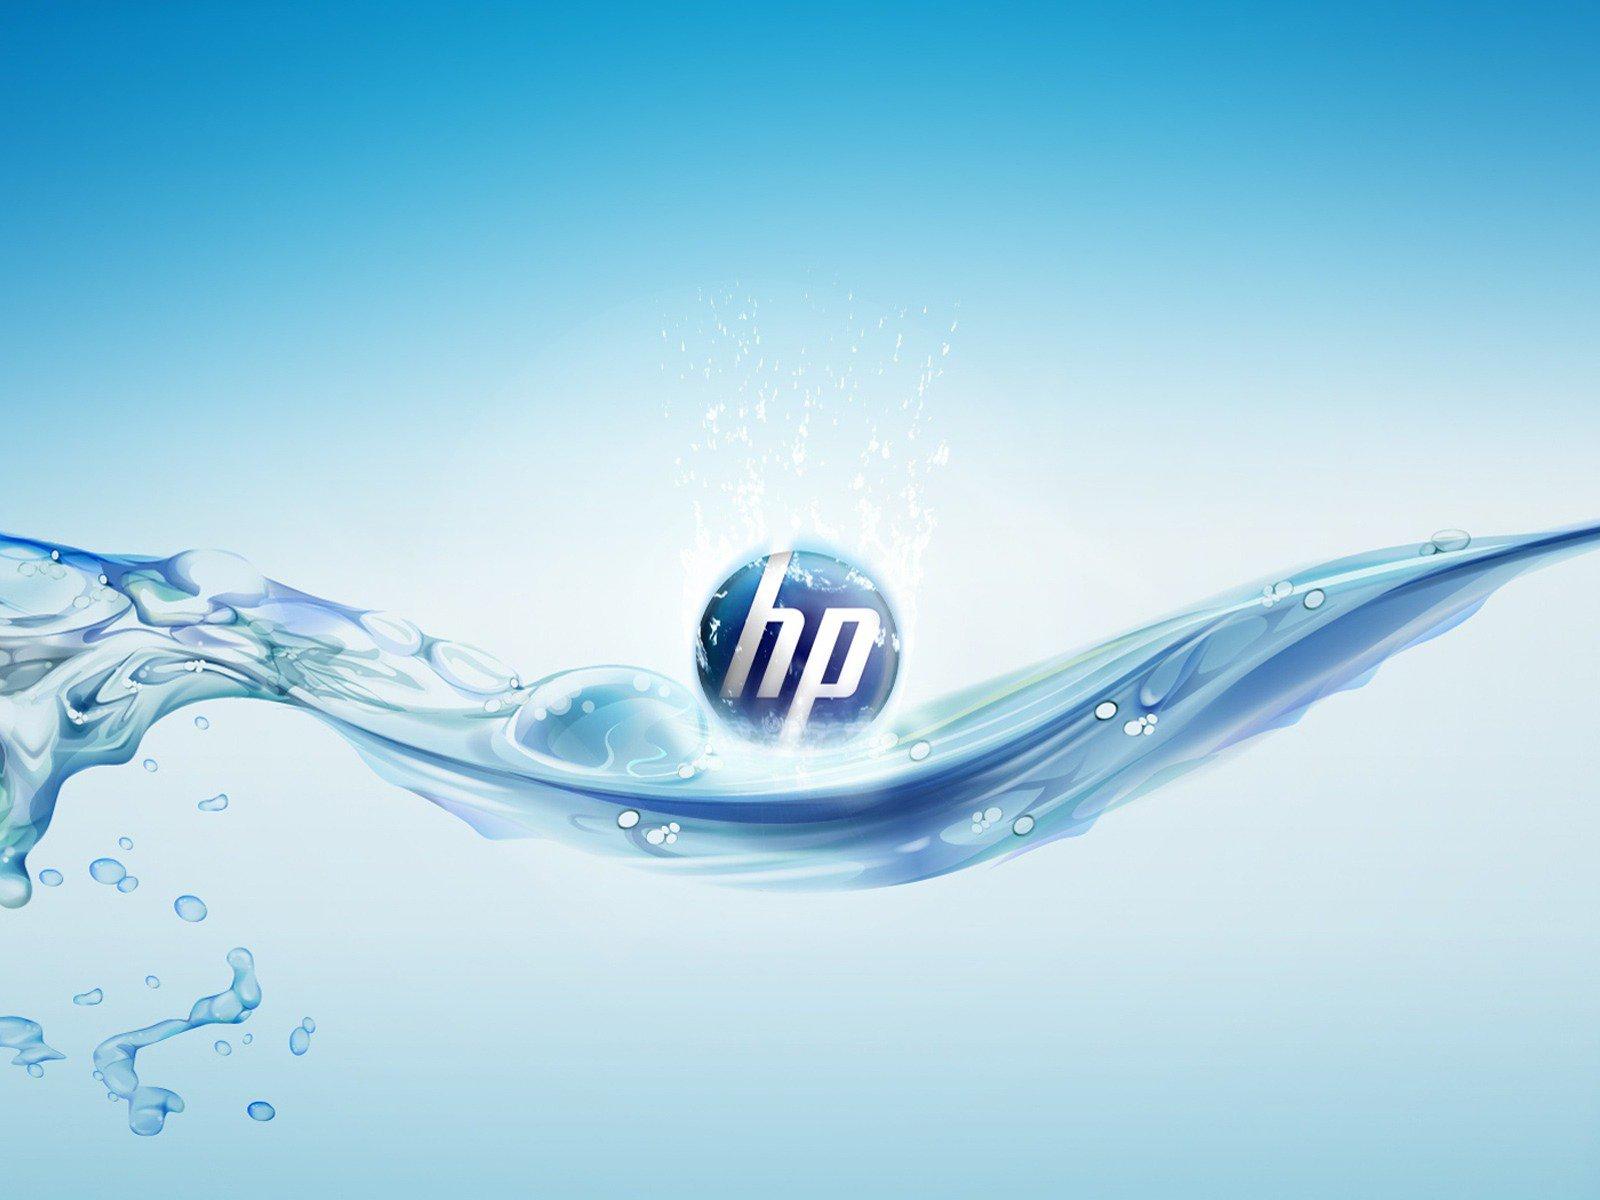 Hp Desktop Wallpapers Windows 7 Desktop Backgrounds For HD 1600x1200